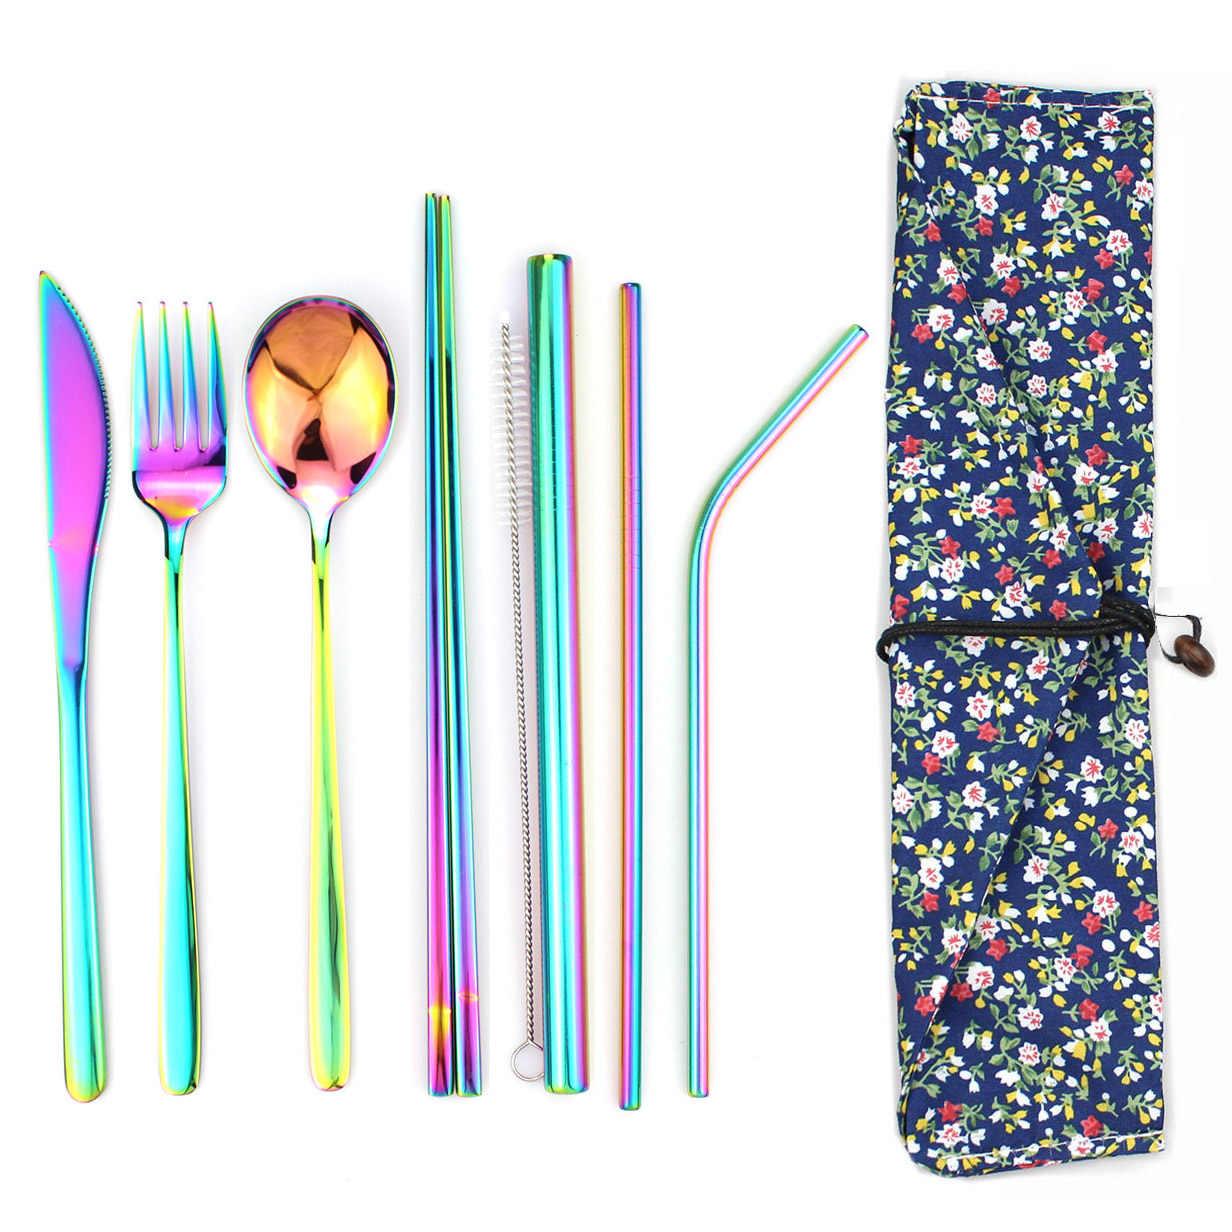 8Pcs Rainbow ชุดอาหารเย็น 304 ช้อนส้อมสแตนเลสสีดำชุดอาหารค่ำมีดช้อนส้อมฟางกระเป๋ากระเป๋าเดินทางบนโต๊ะอาหารชุด